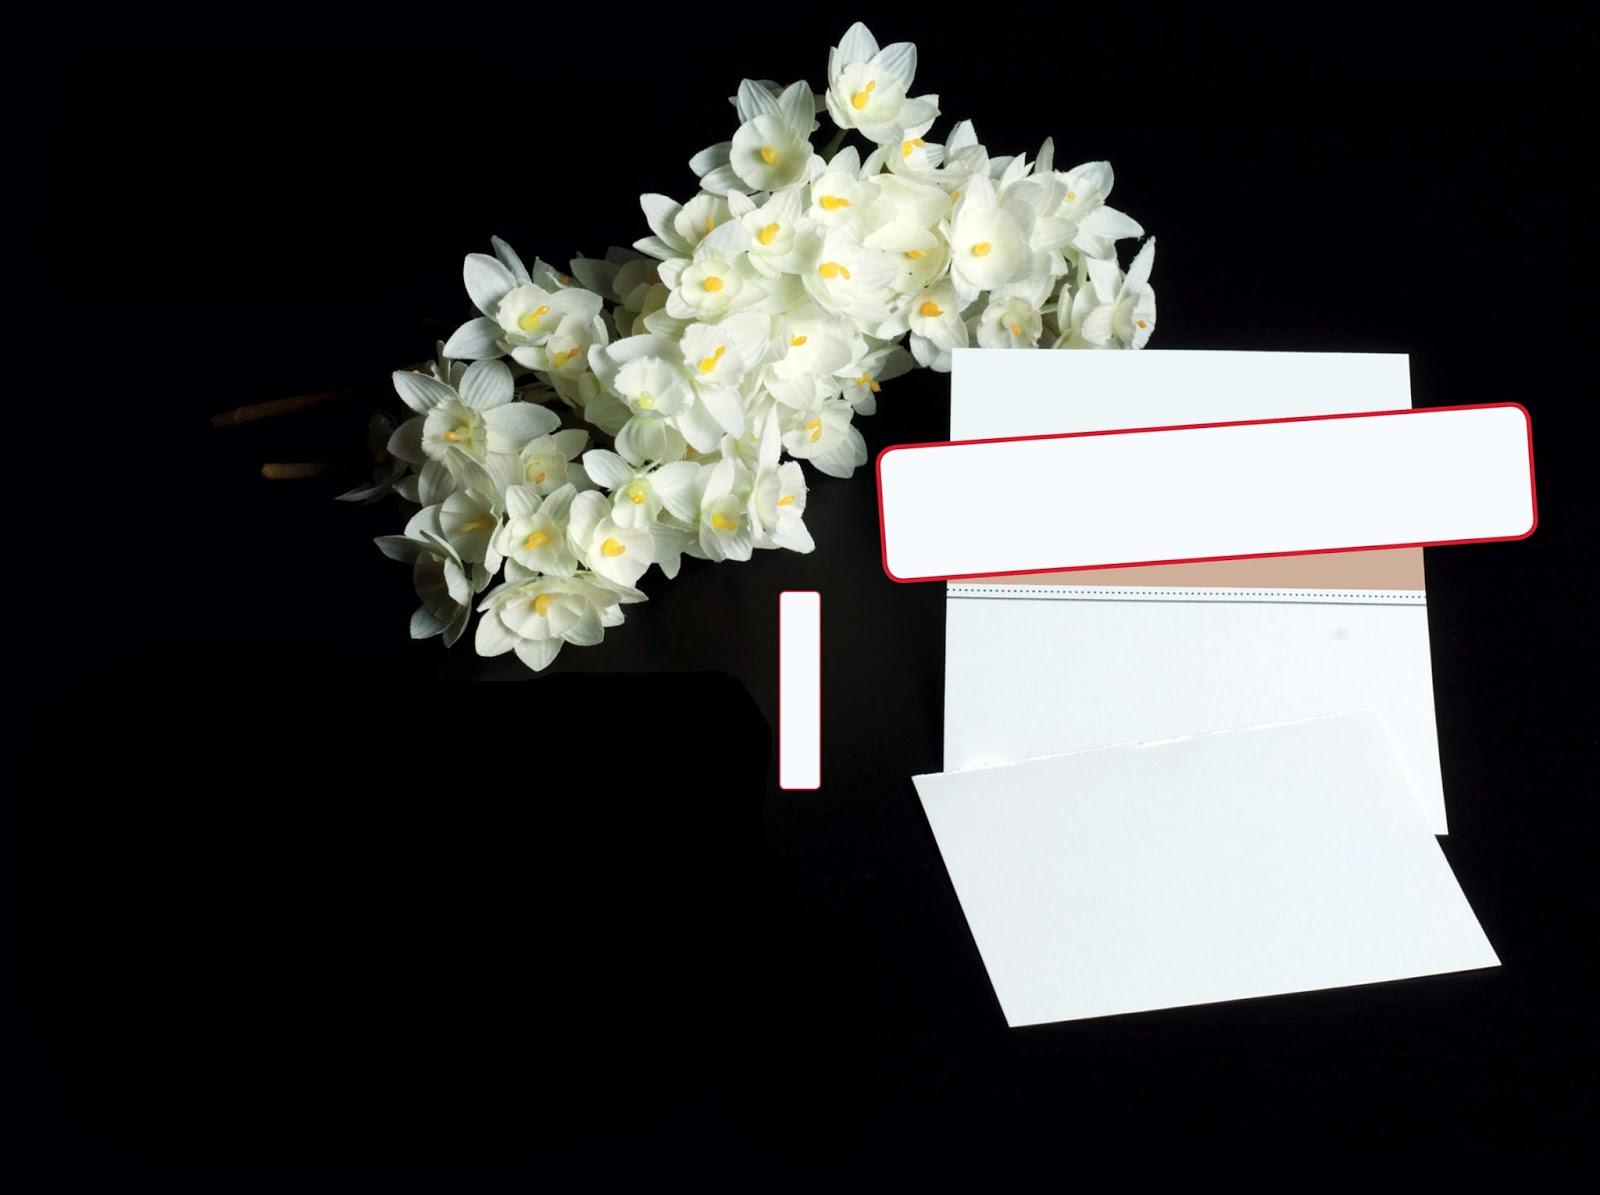 Photos Bank غلاف رومنسي Romance Cover